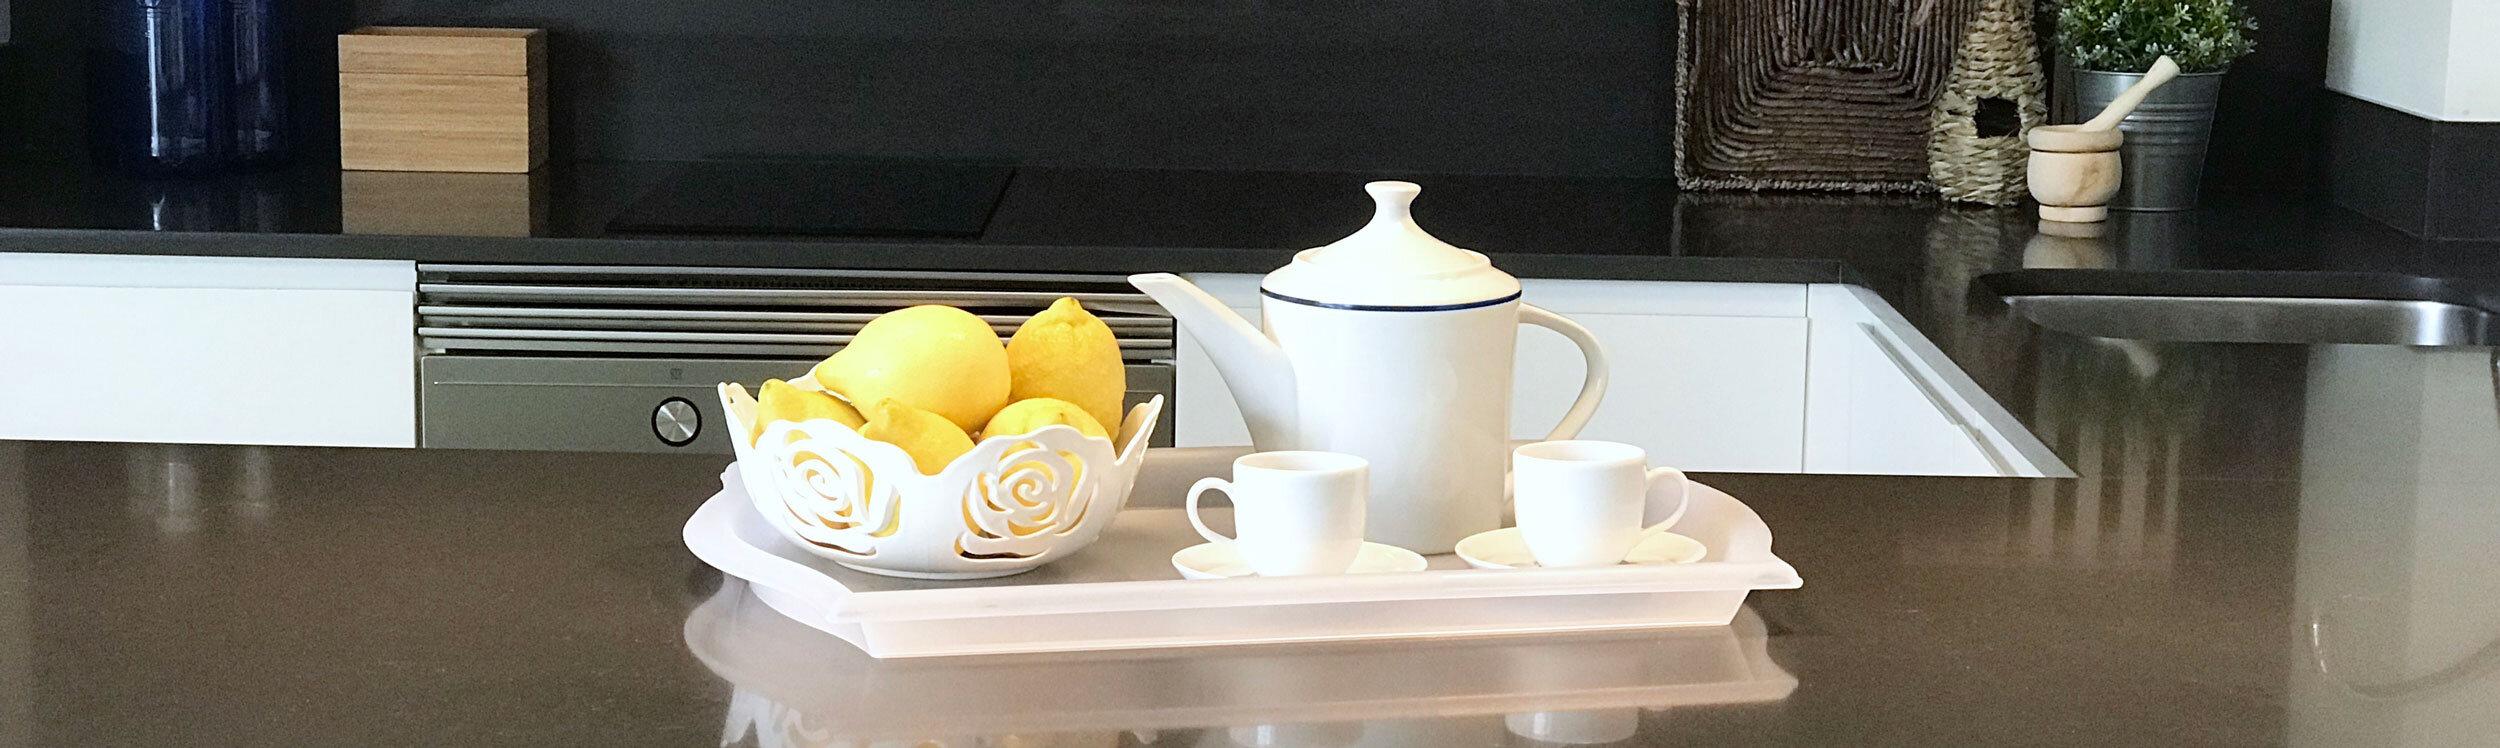 kitchen-lemons-tea-set.jpg